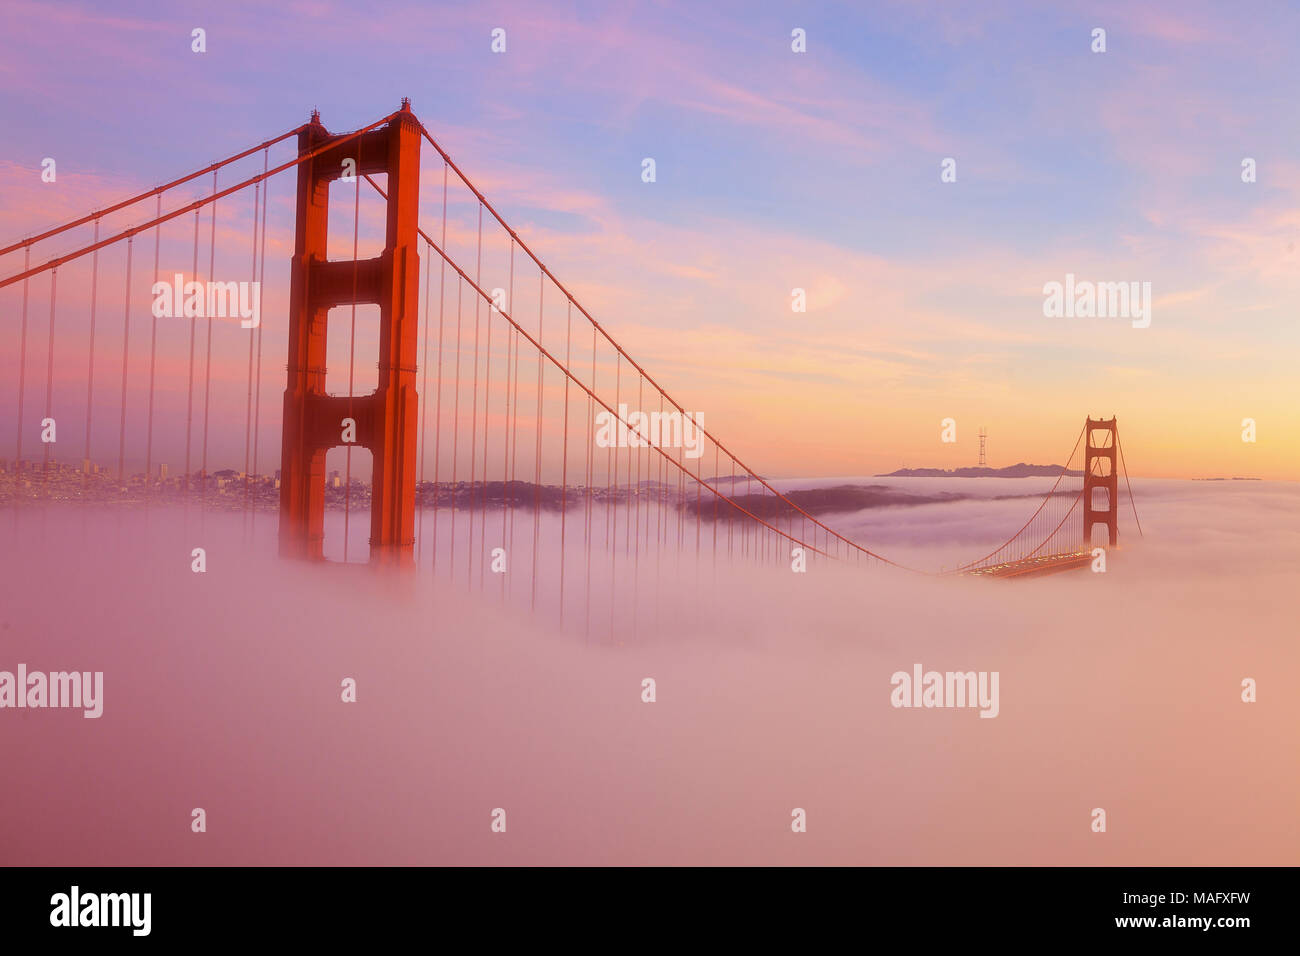 The Golden Gate Bridge is a popuar tourist destination in San Francisco California. - Stock Image